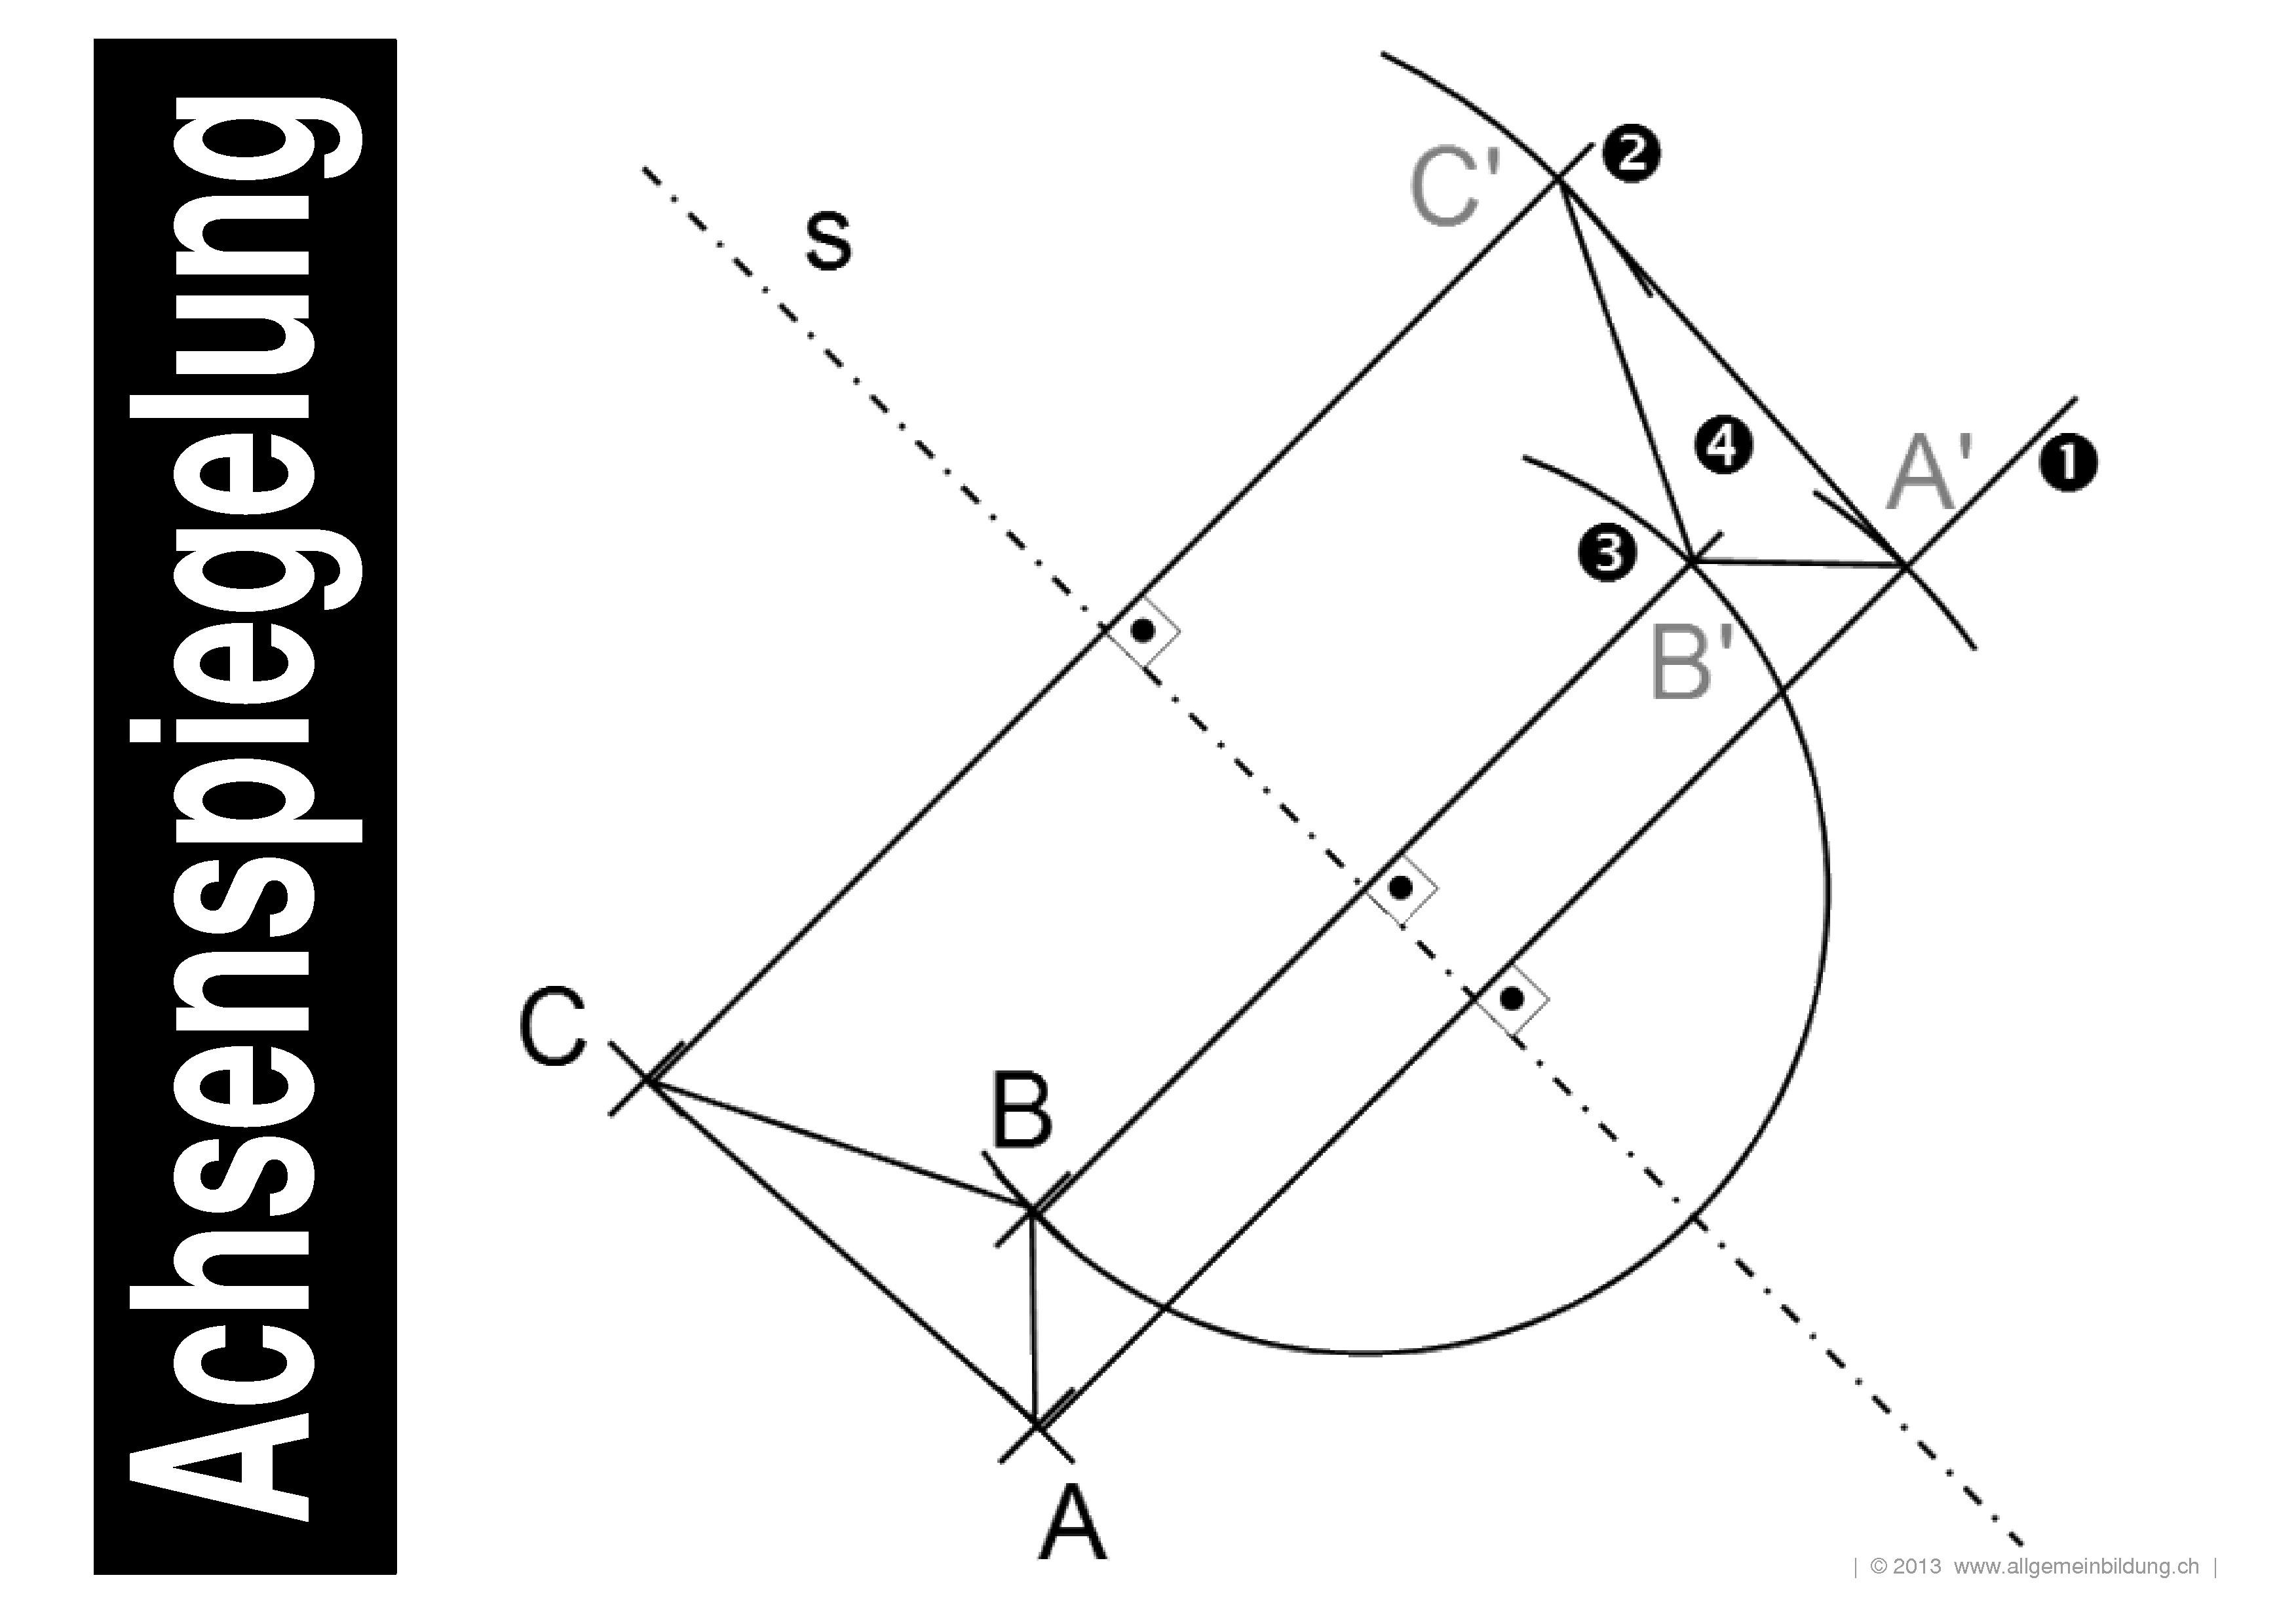 Mathematik & Geometrie | LernPlakate Wissensposter Abbildungen ...